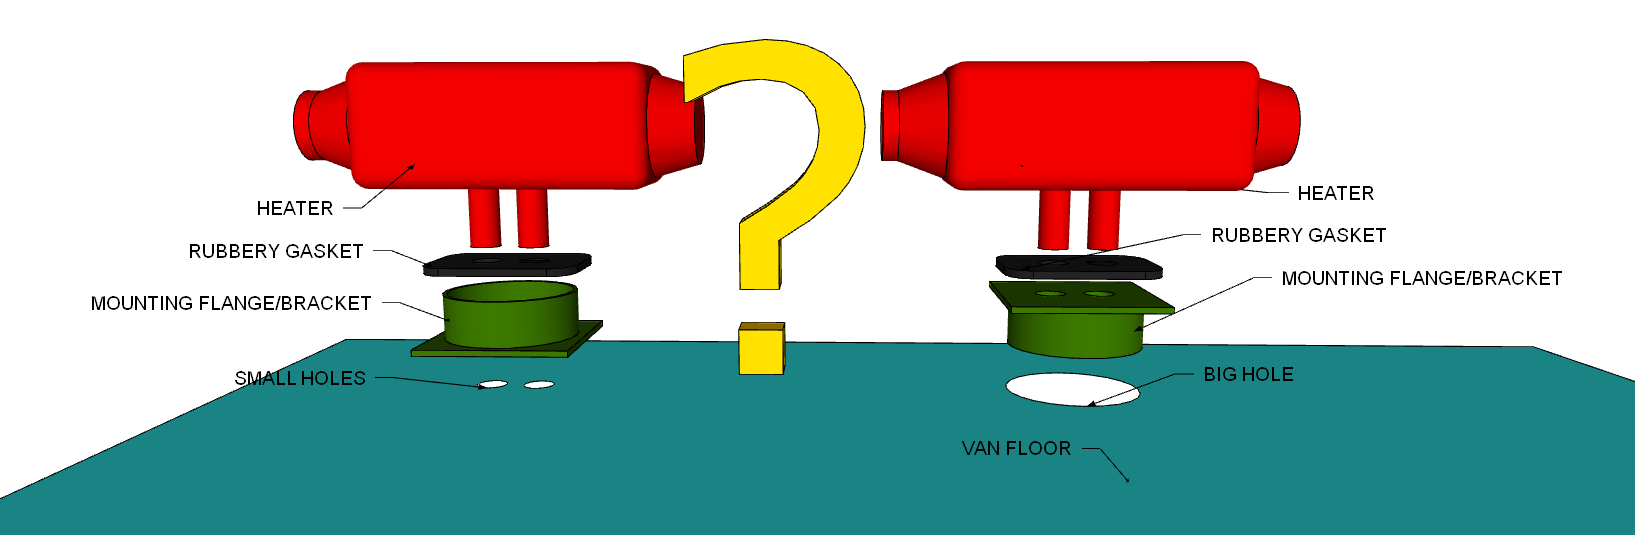 Converting A Sprinter Van To Camper Installing Diesel Driven Espar D2 Heater Wiring Diagram